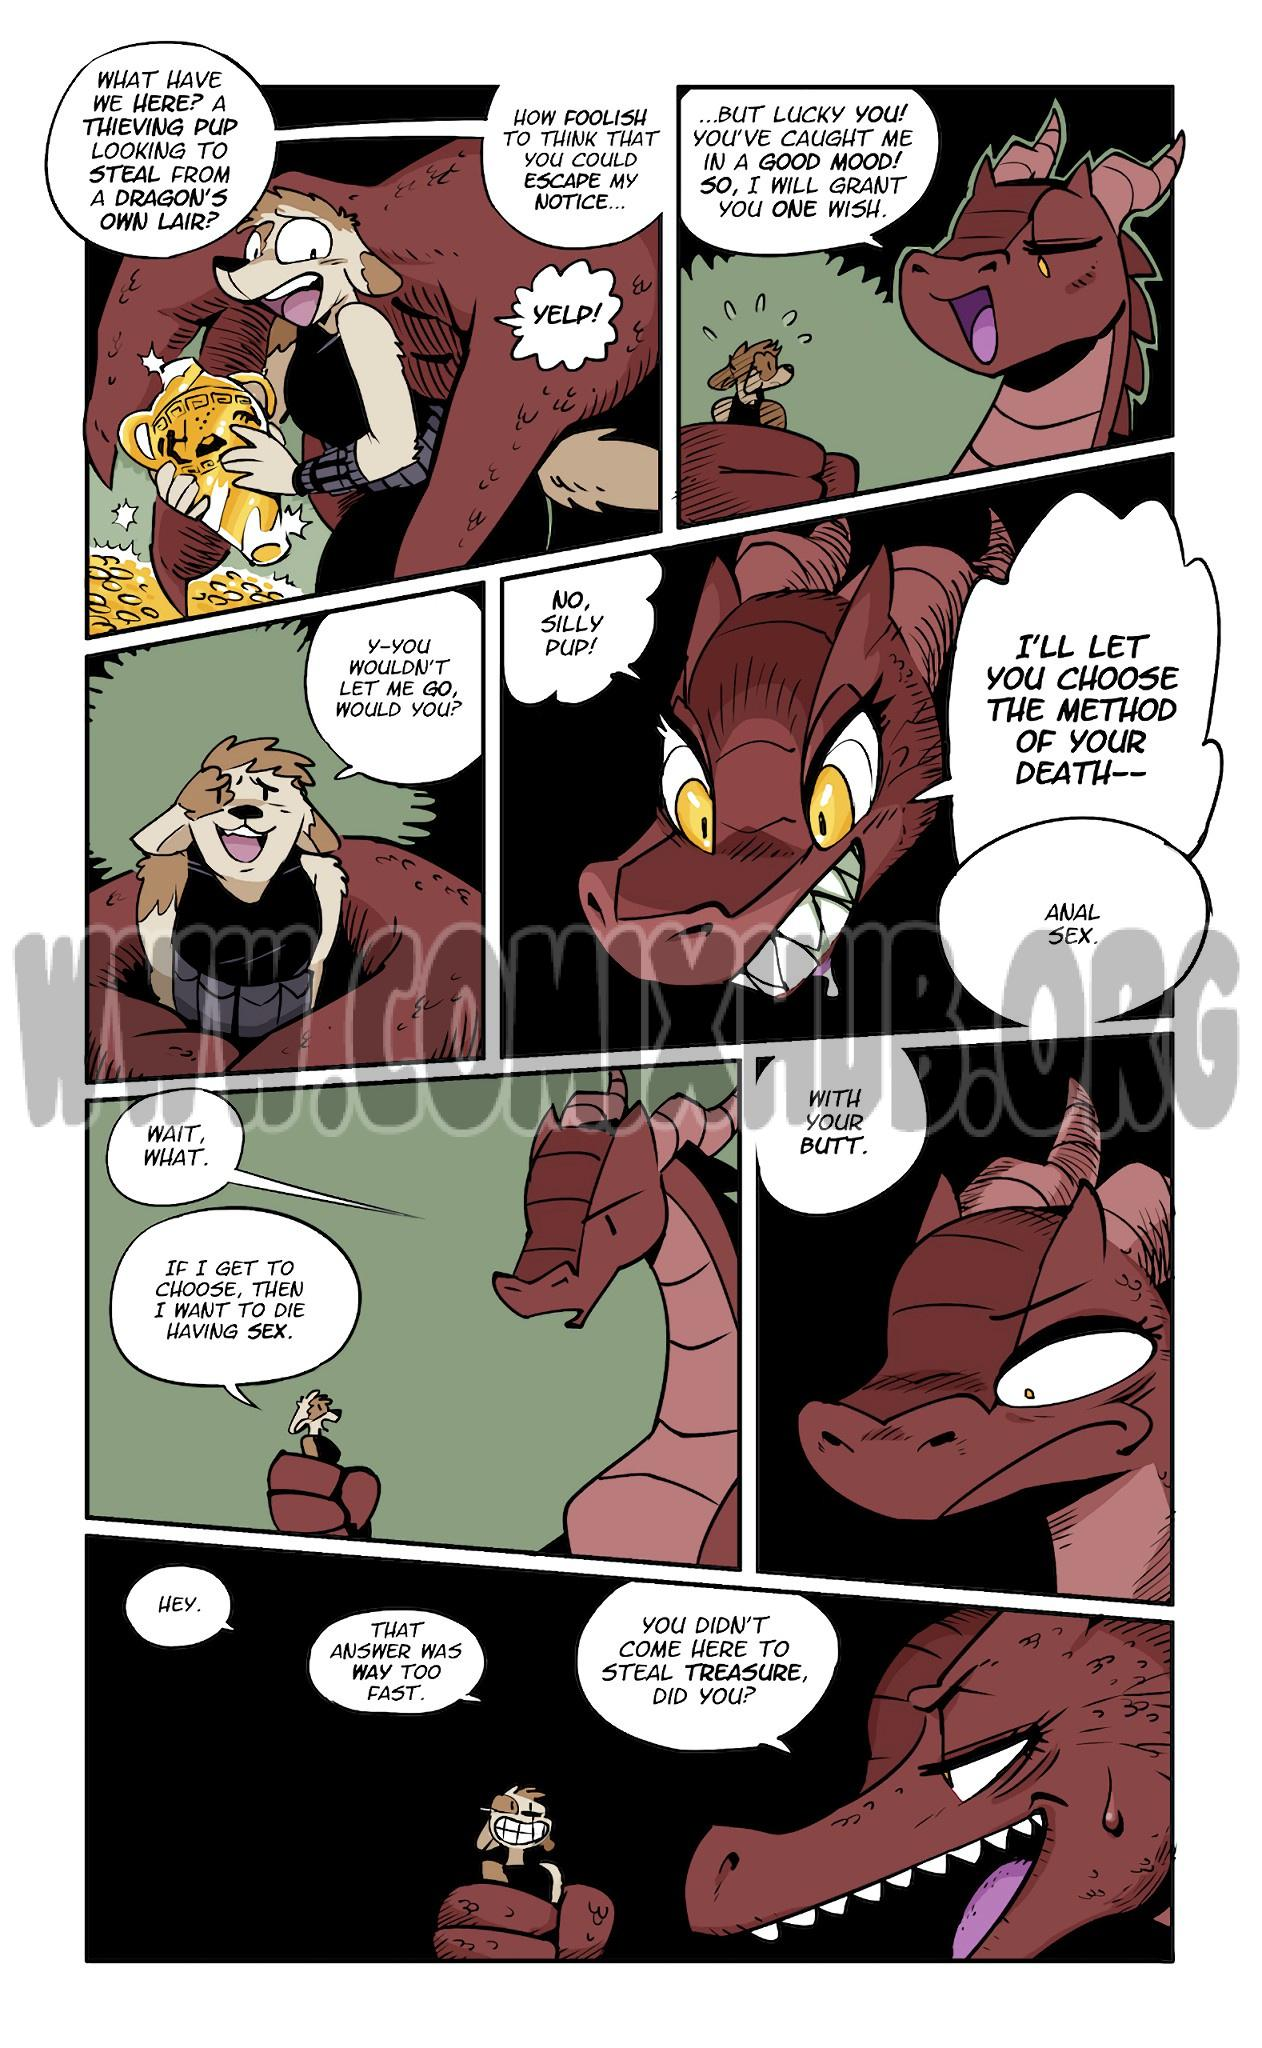 Death by Dragon Butt porn comics Anal Sex, Fantasy, Furry, X-Ray